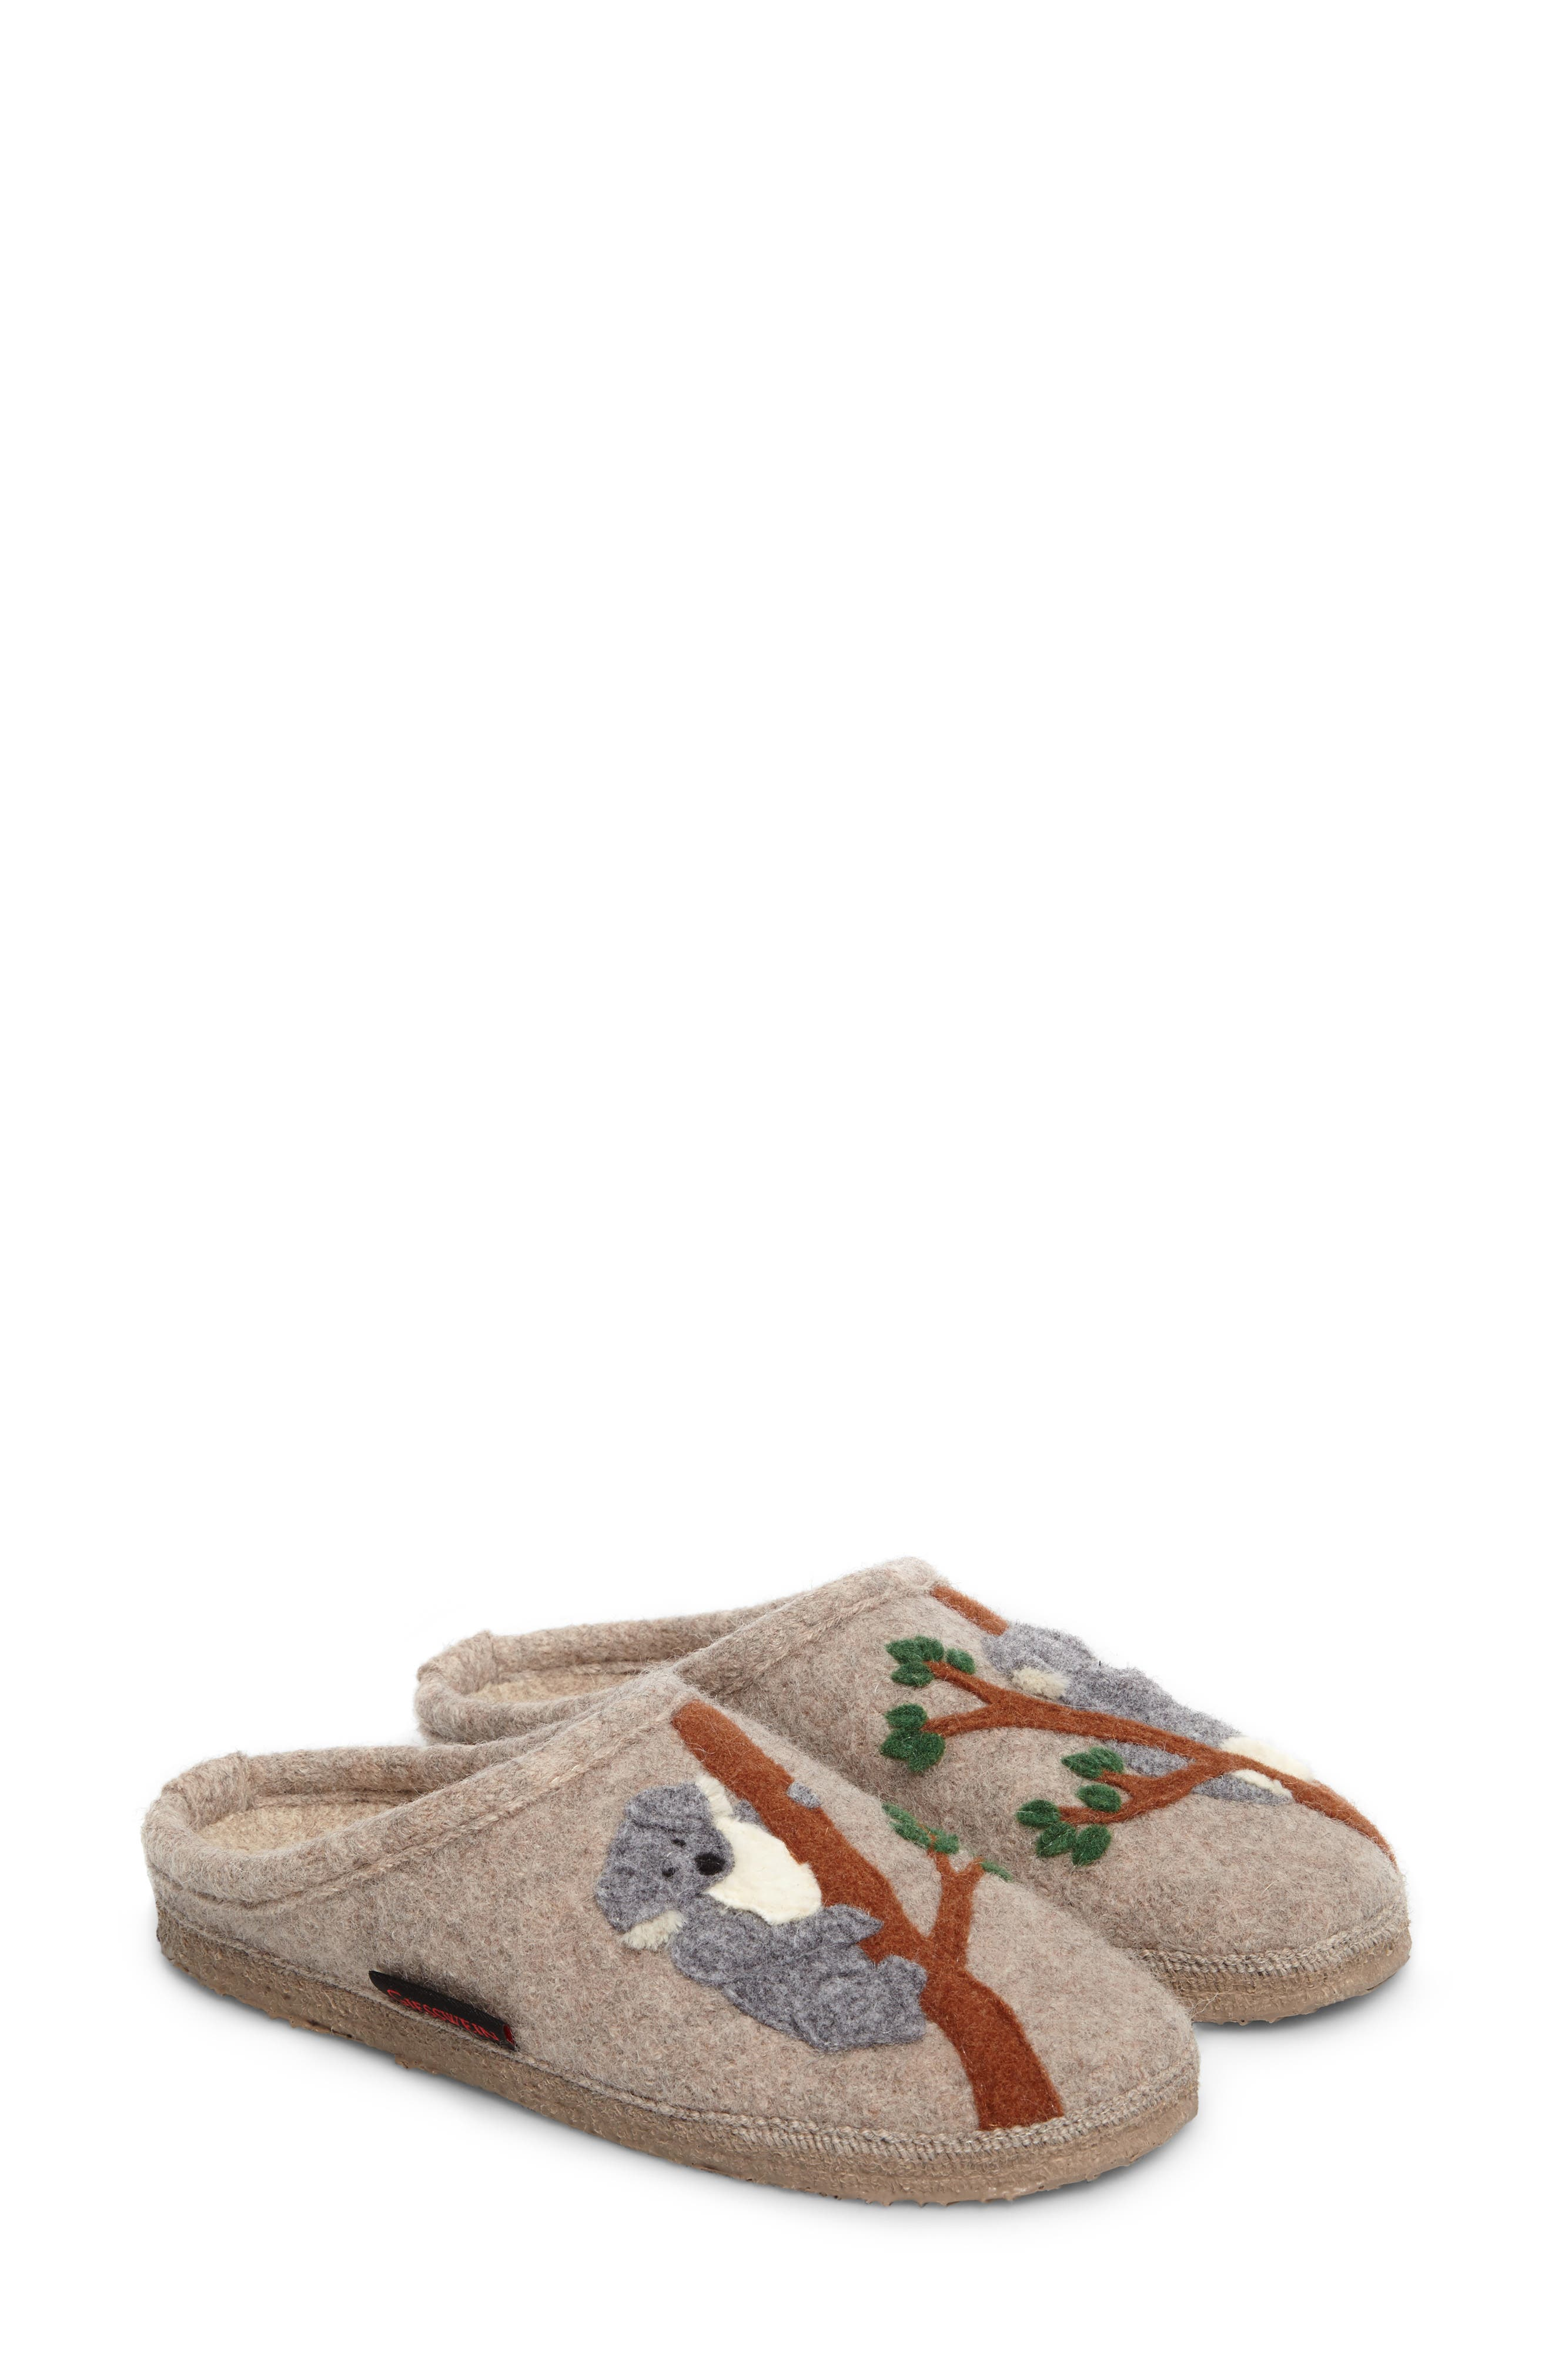 Koala Indoor Boiled Wool Slipper,                             Main thumbnail 1, color,                             NATURAL WOOL